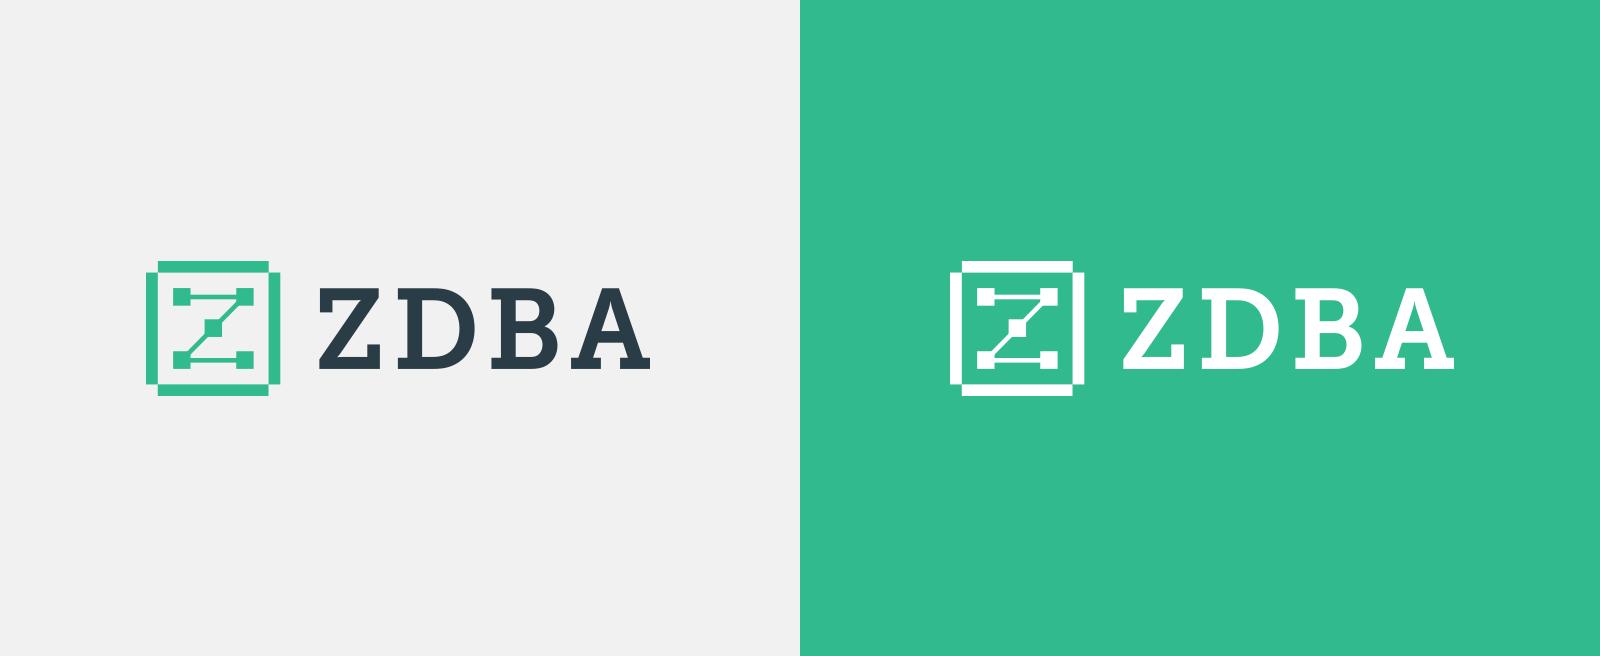 zdba logo versions